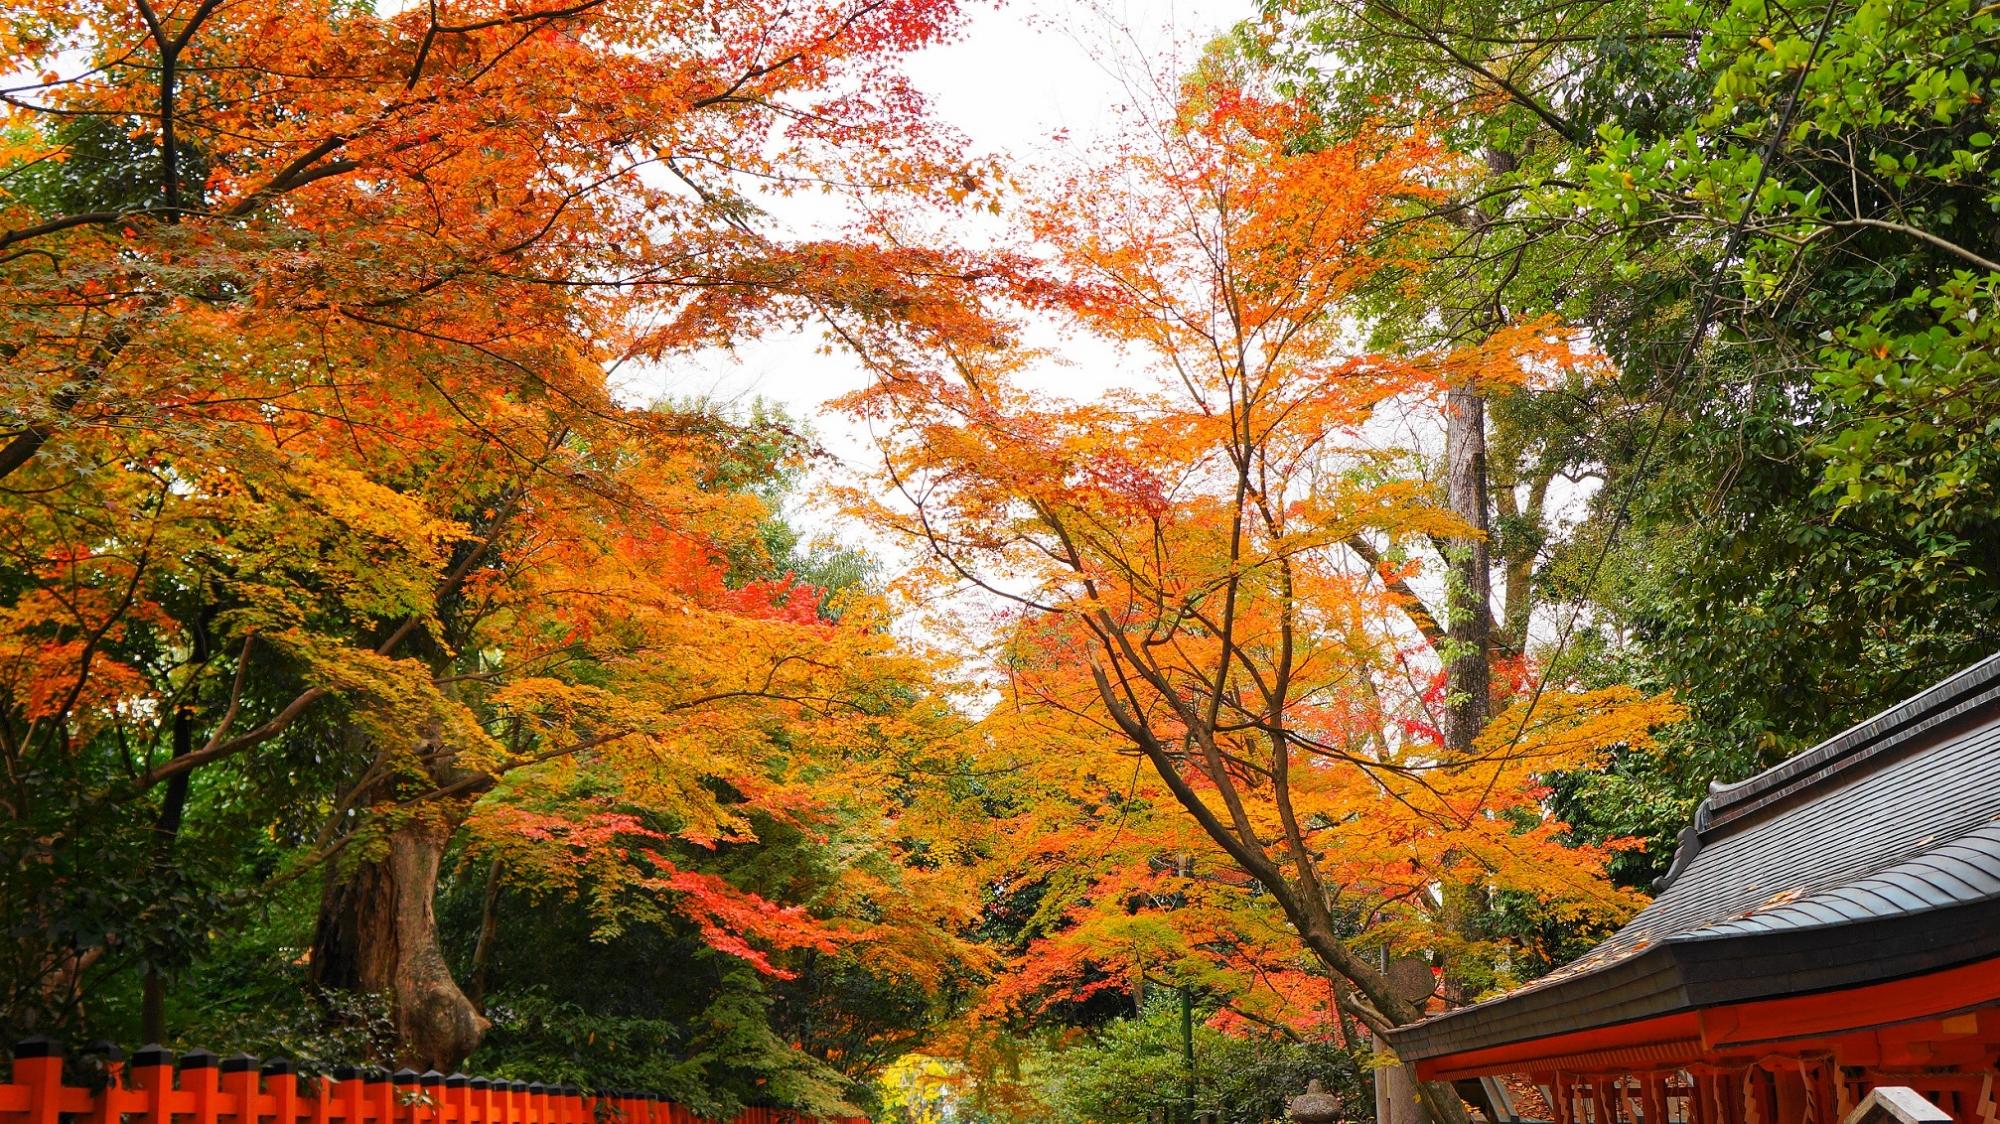 Yasaka-jinja Shrine Kyoto autumn leaves 見ごろ 日吉社 八坂神社